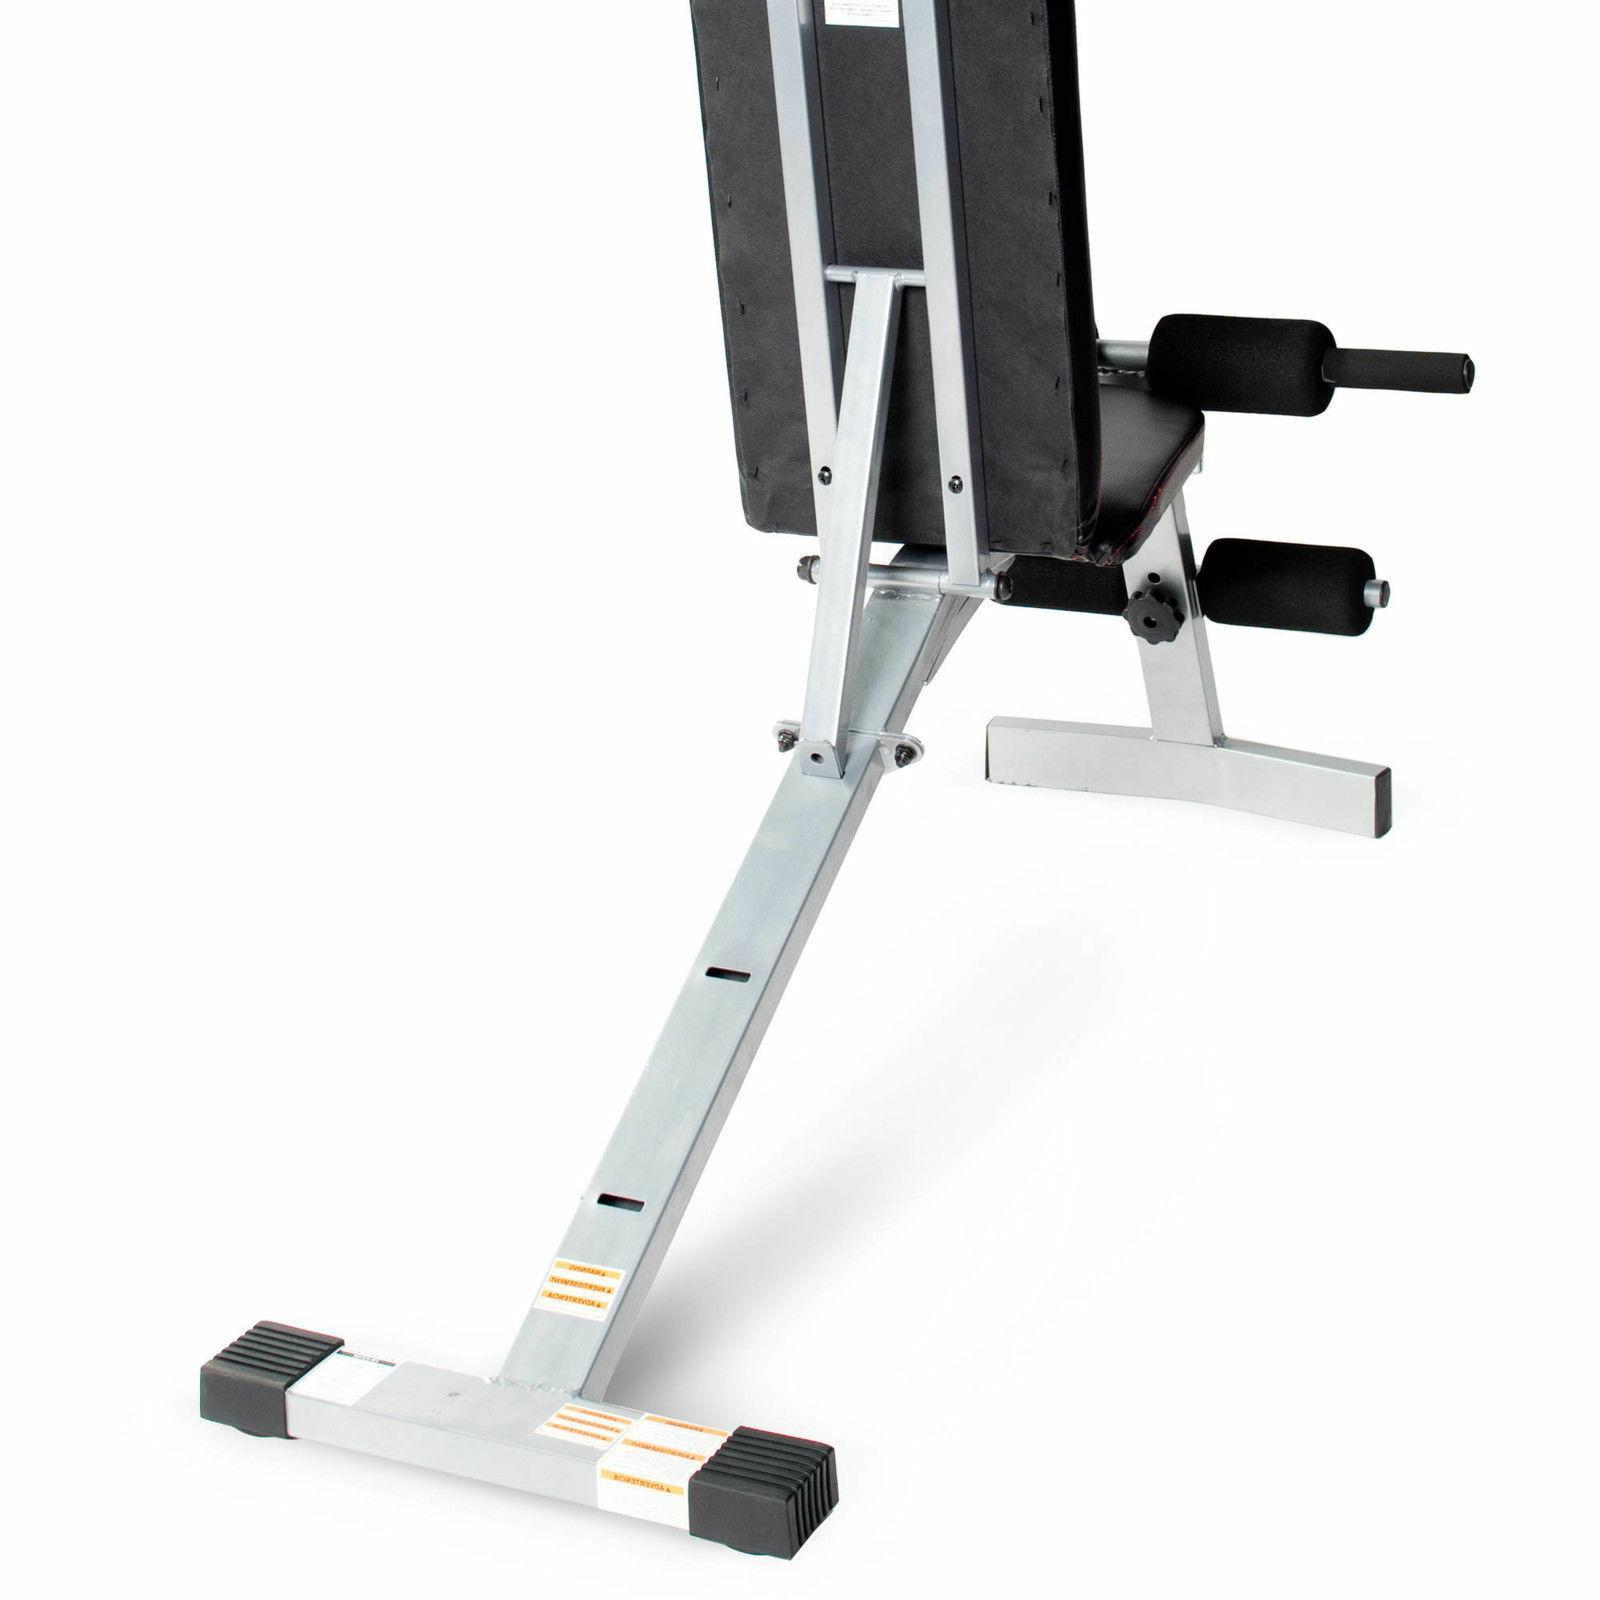 Home Gym - FID lb Iron Hex 10 Dumbbell Set Storage Rack